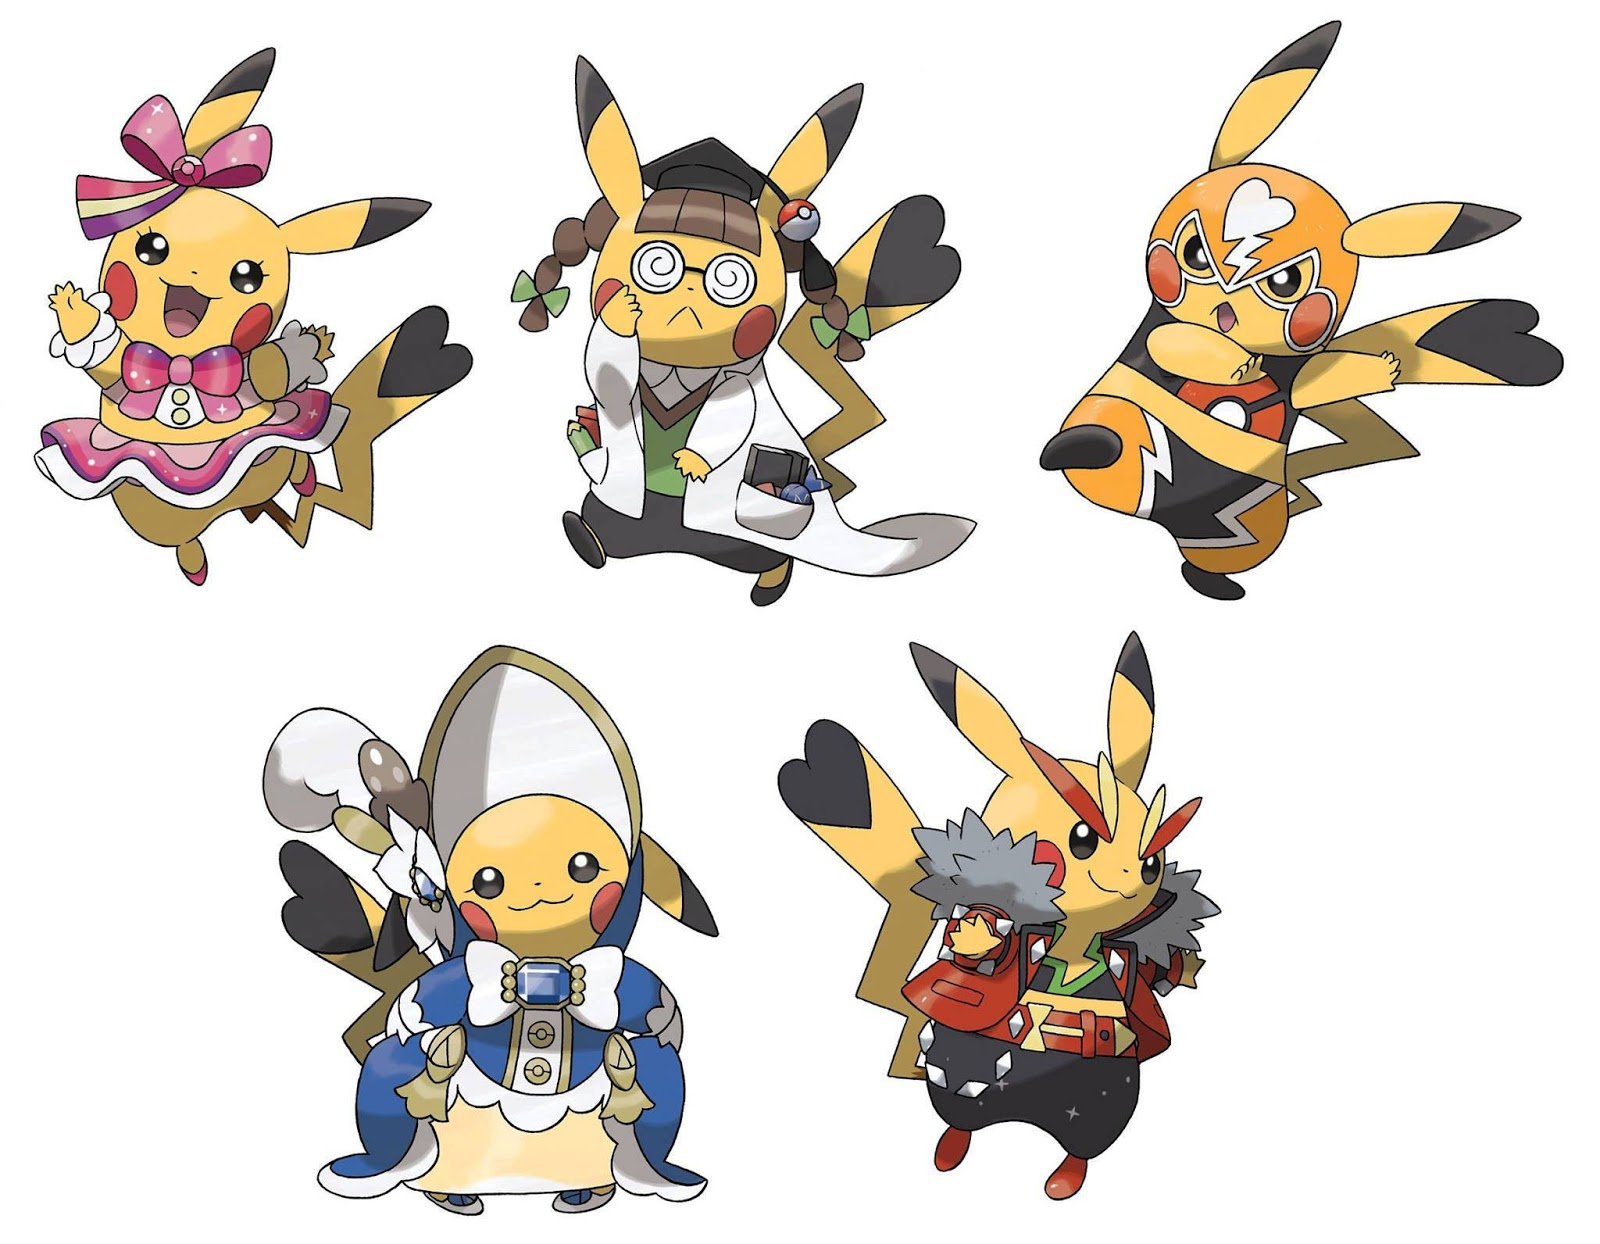 Pokémon by Review: #172, #25 - #26: Pichu, Pikachu & Raichu